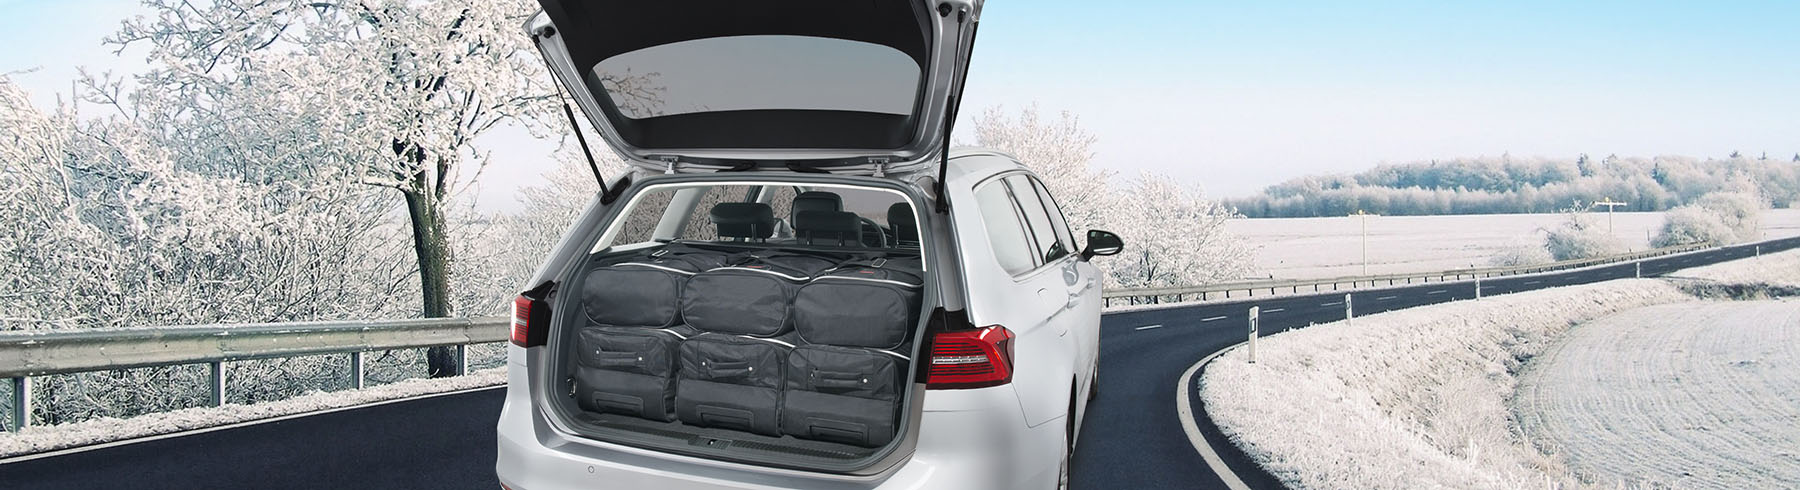 car-bags-concept-winter-02